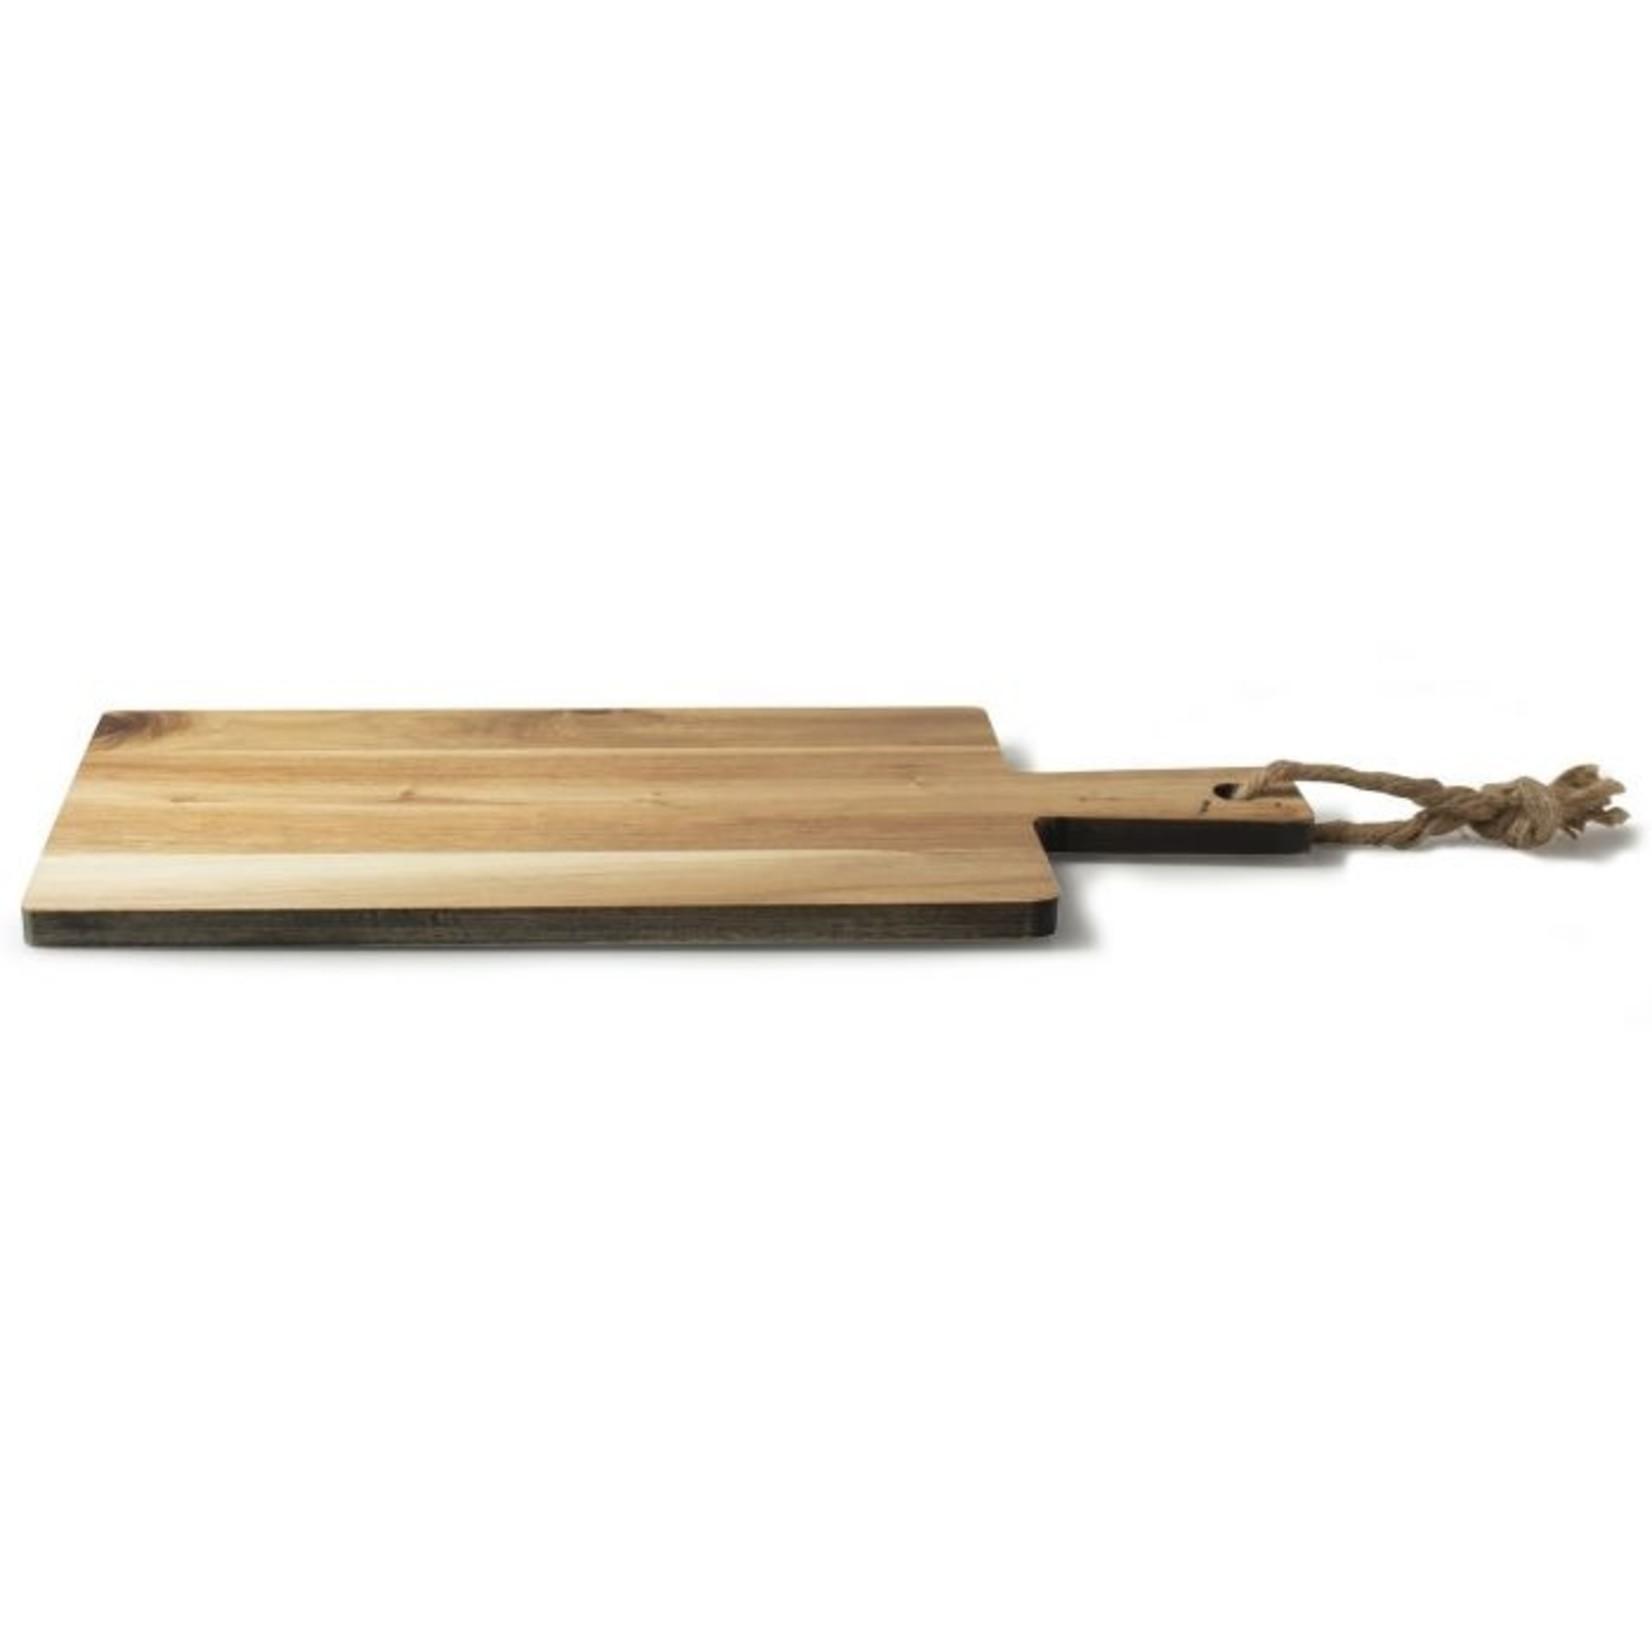 Gusta Serveerplank - Acacia - 48x19x2cm